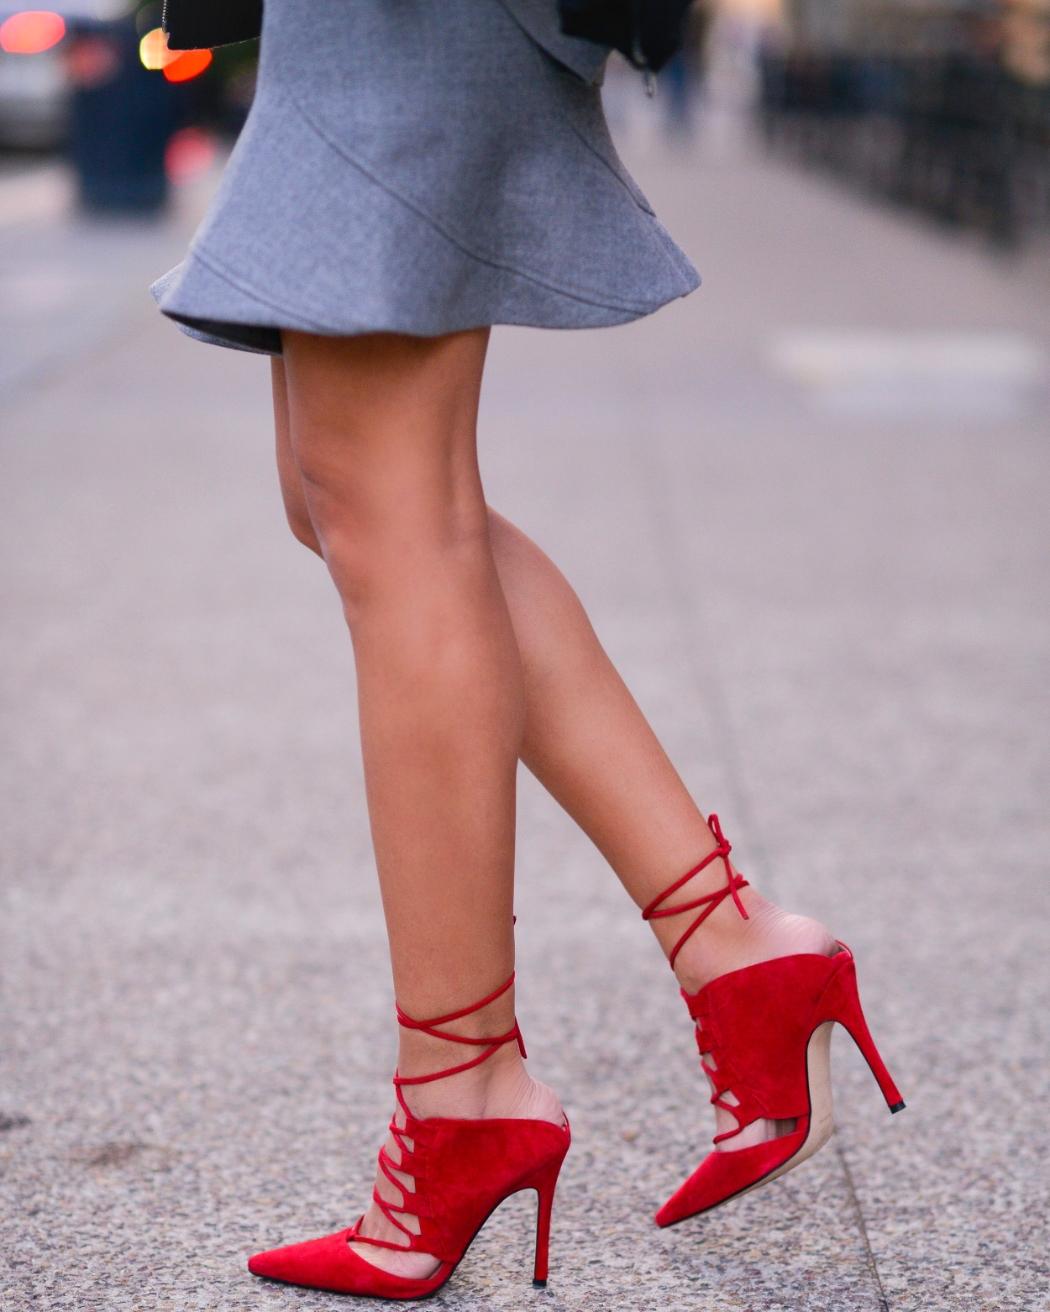 JCrew_Skirt_Topshop_Zara_Streetfashion_SanDiego_Downtown_LucysWhims_FashionBlogger.jpg